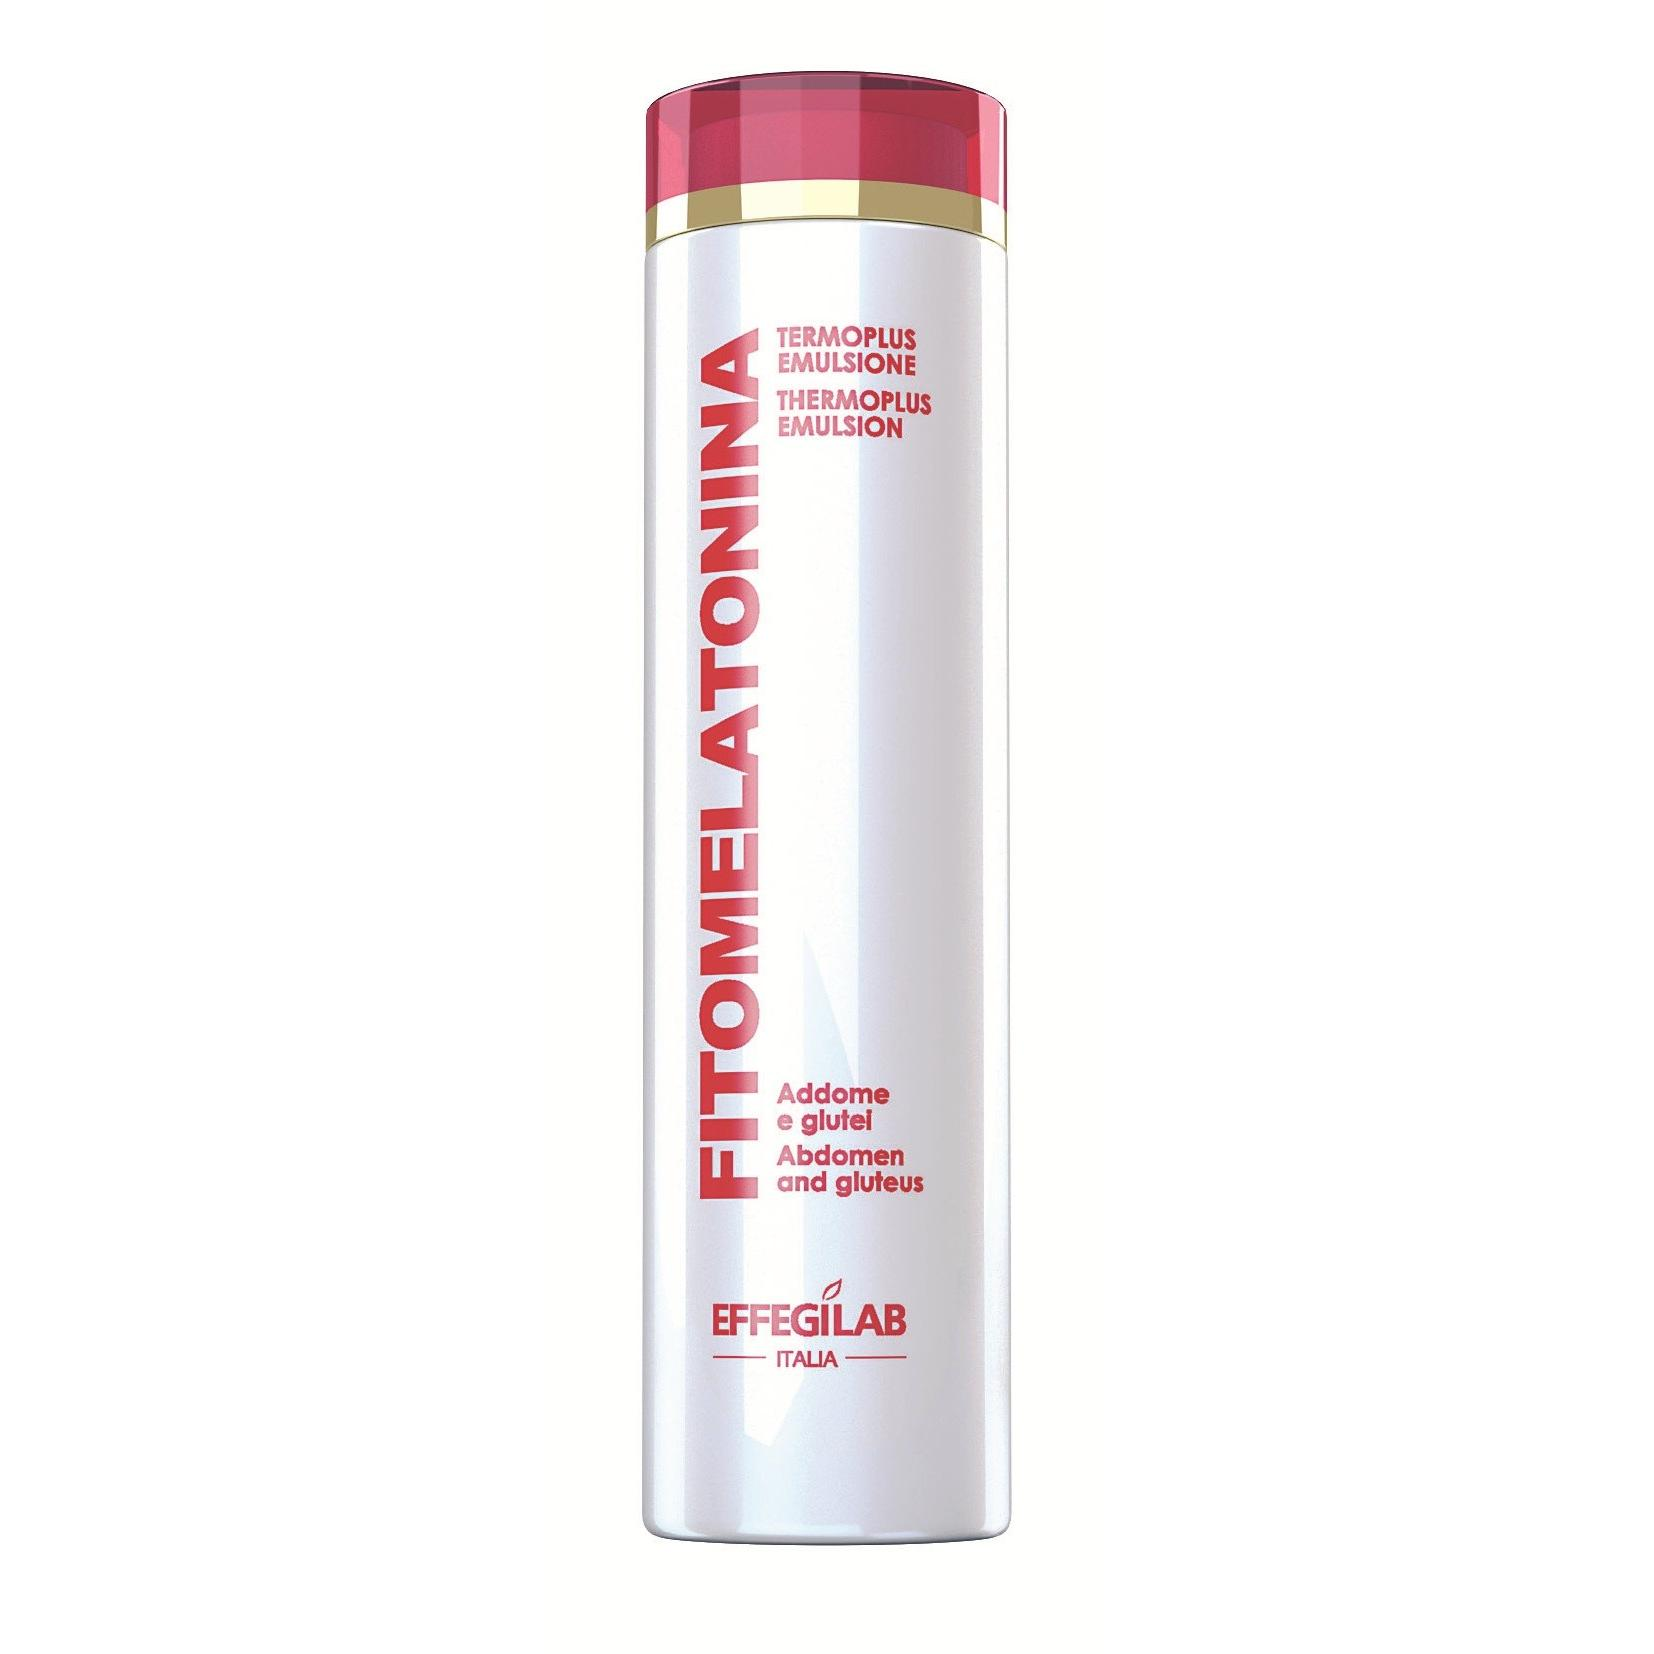 FITOMELATONINA TERMOPLUS EMULSION 200 ml